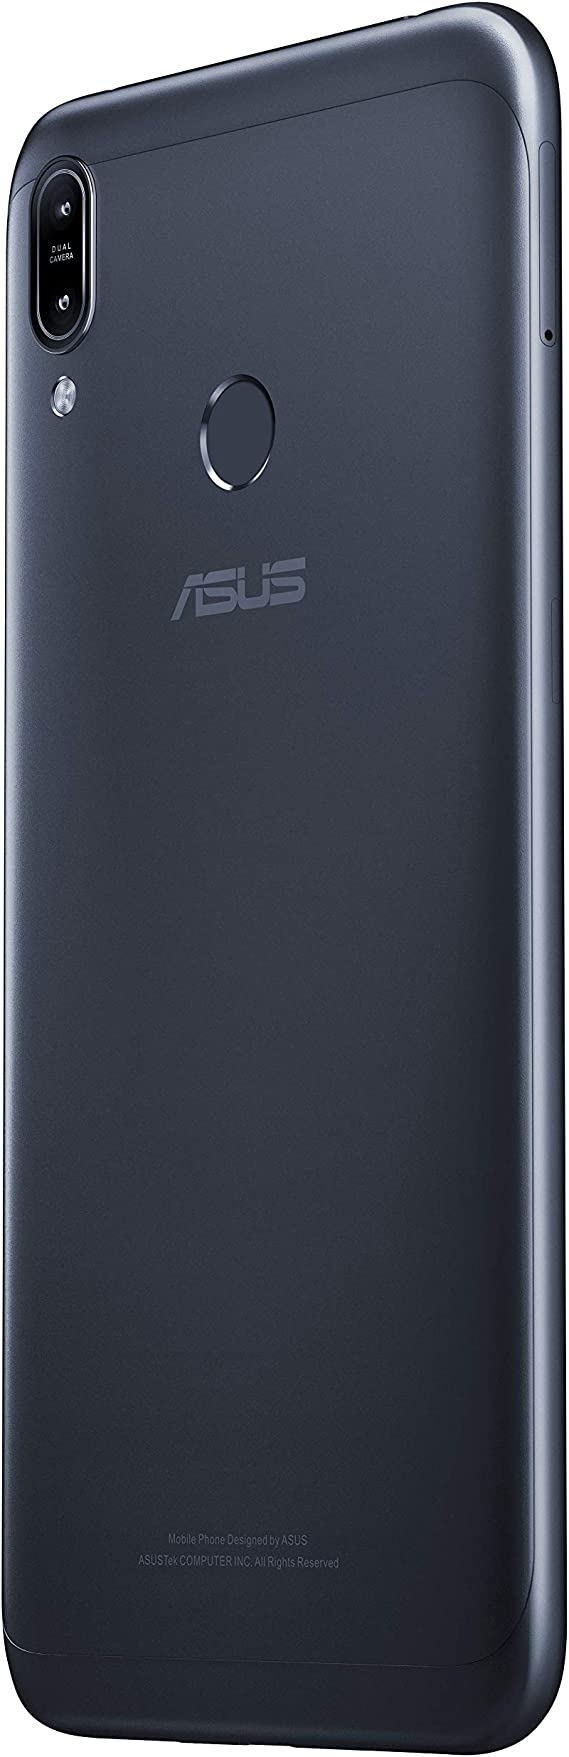 ASUS ZenFone ZB633KL-4A070EU 16 cm (6.3